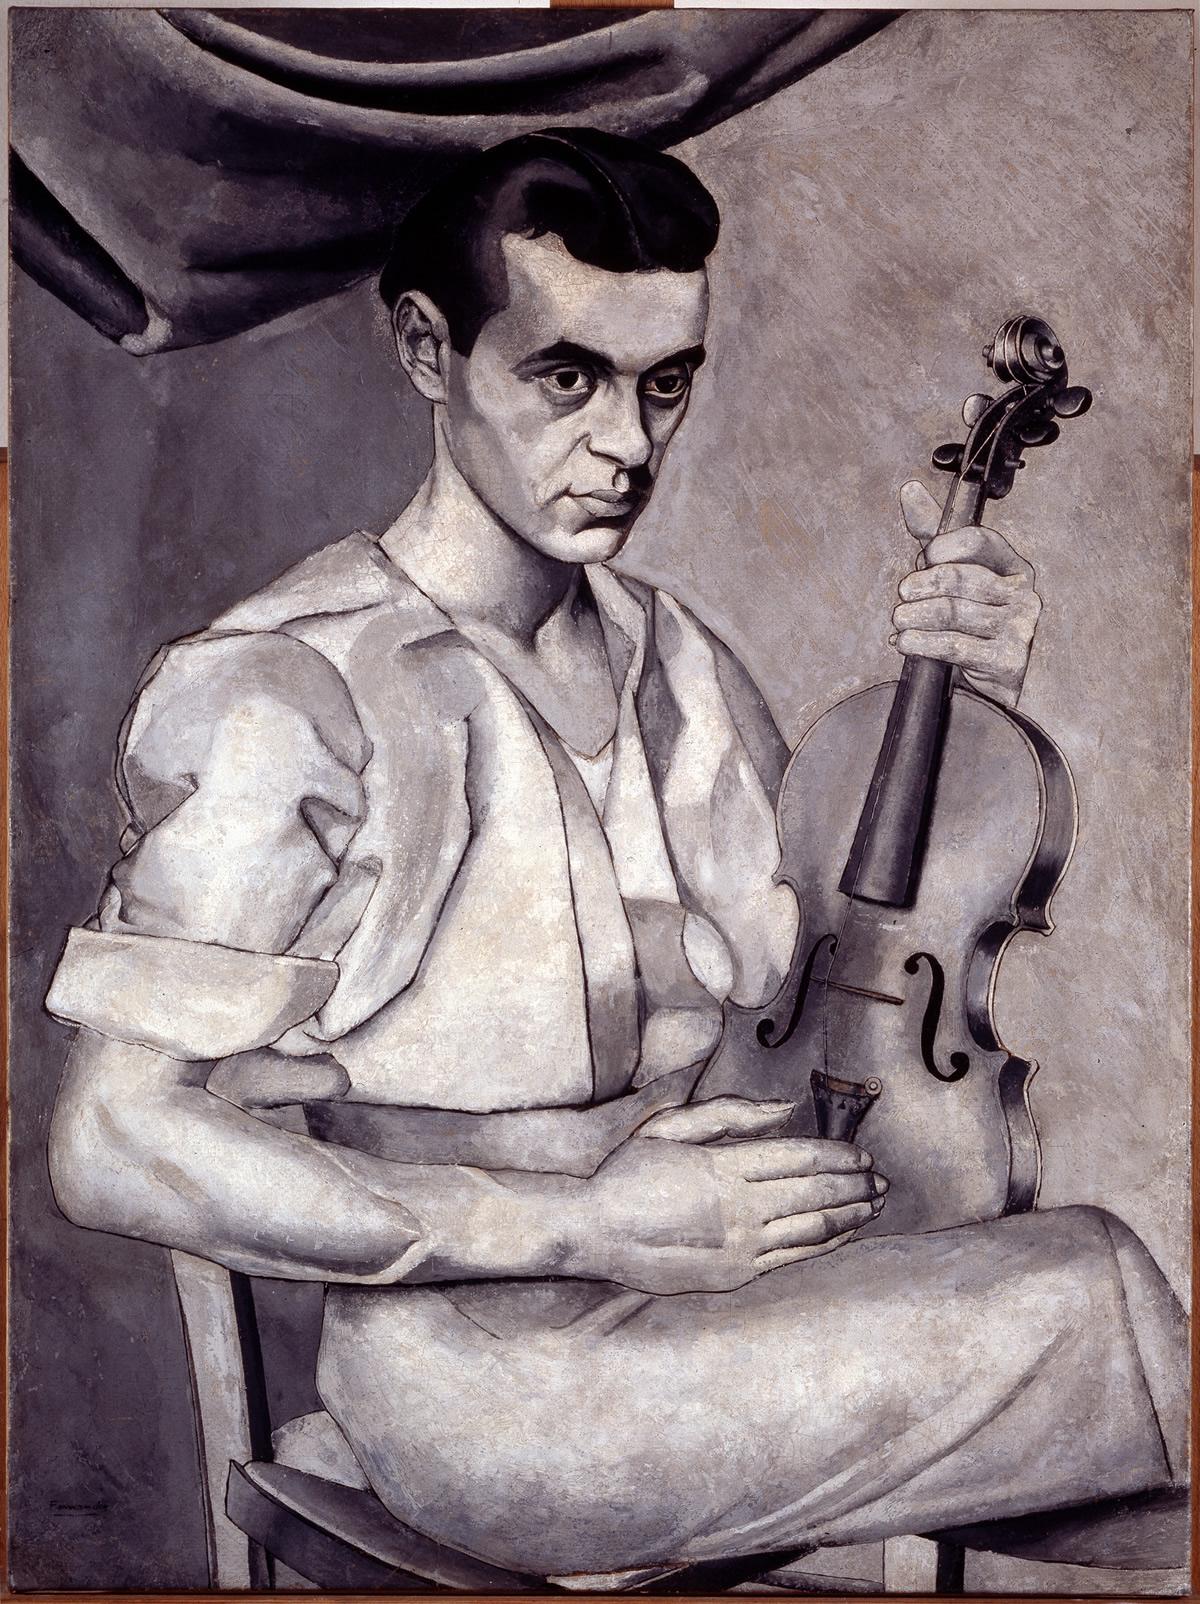 Luis Fernández. Portrait (Retrato), c. 1934-1935. Museo Nacional Centro de Arte Reina Sofía, Madrid.